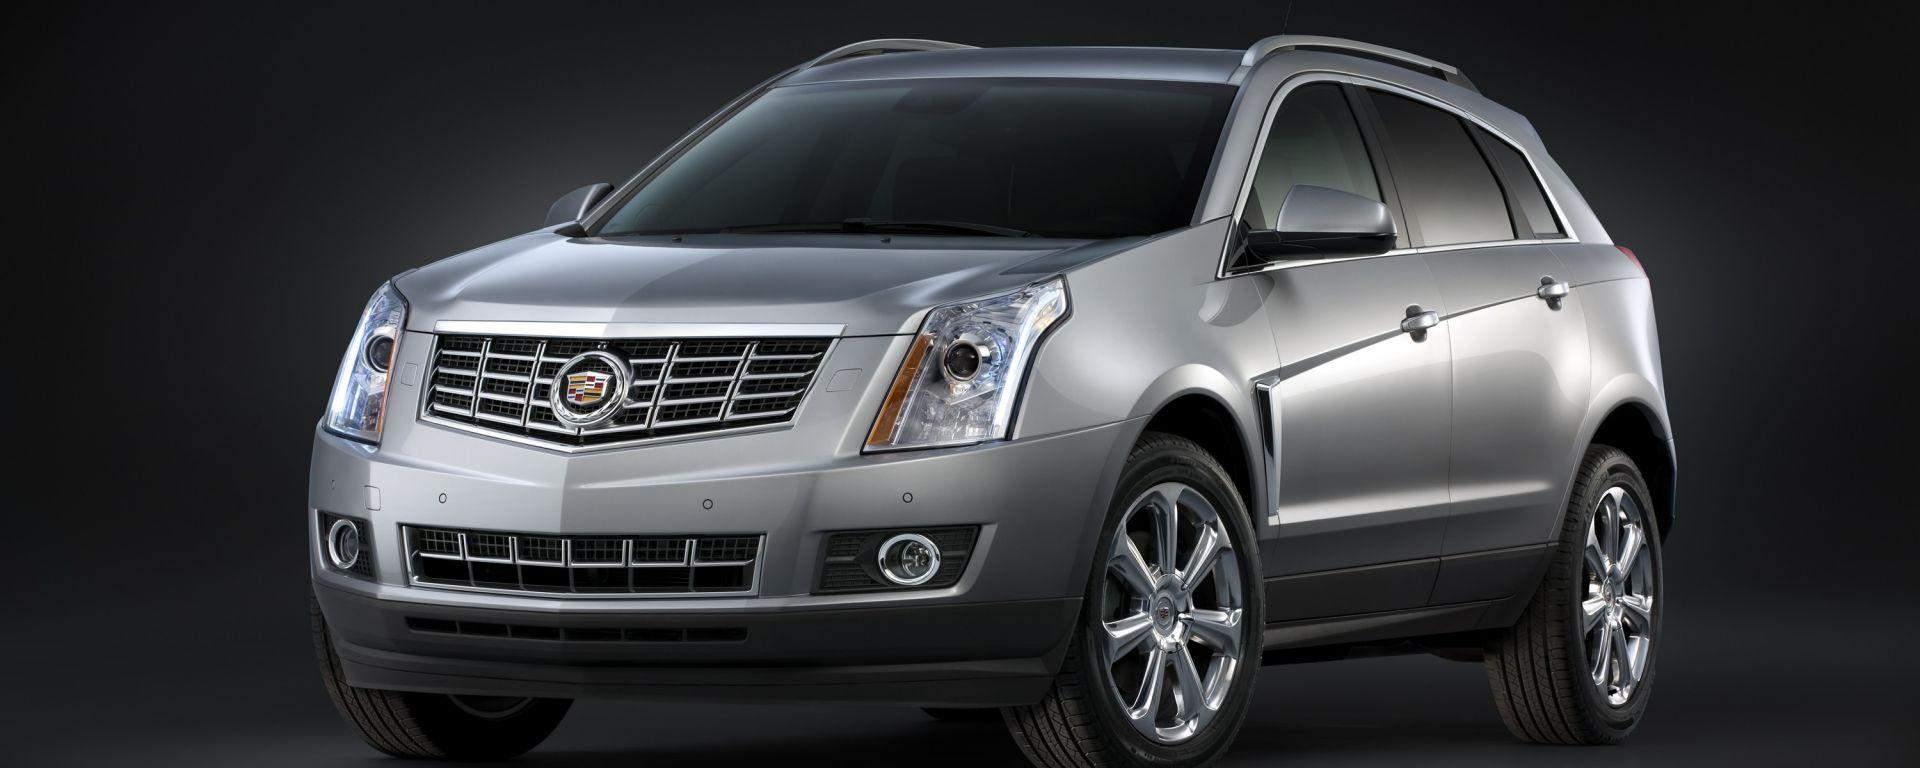 Cadillac SRX my 2013